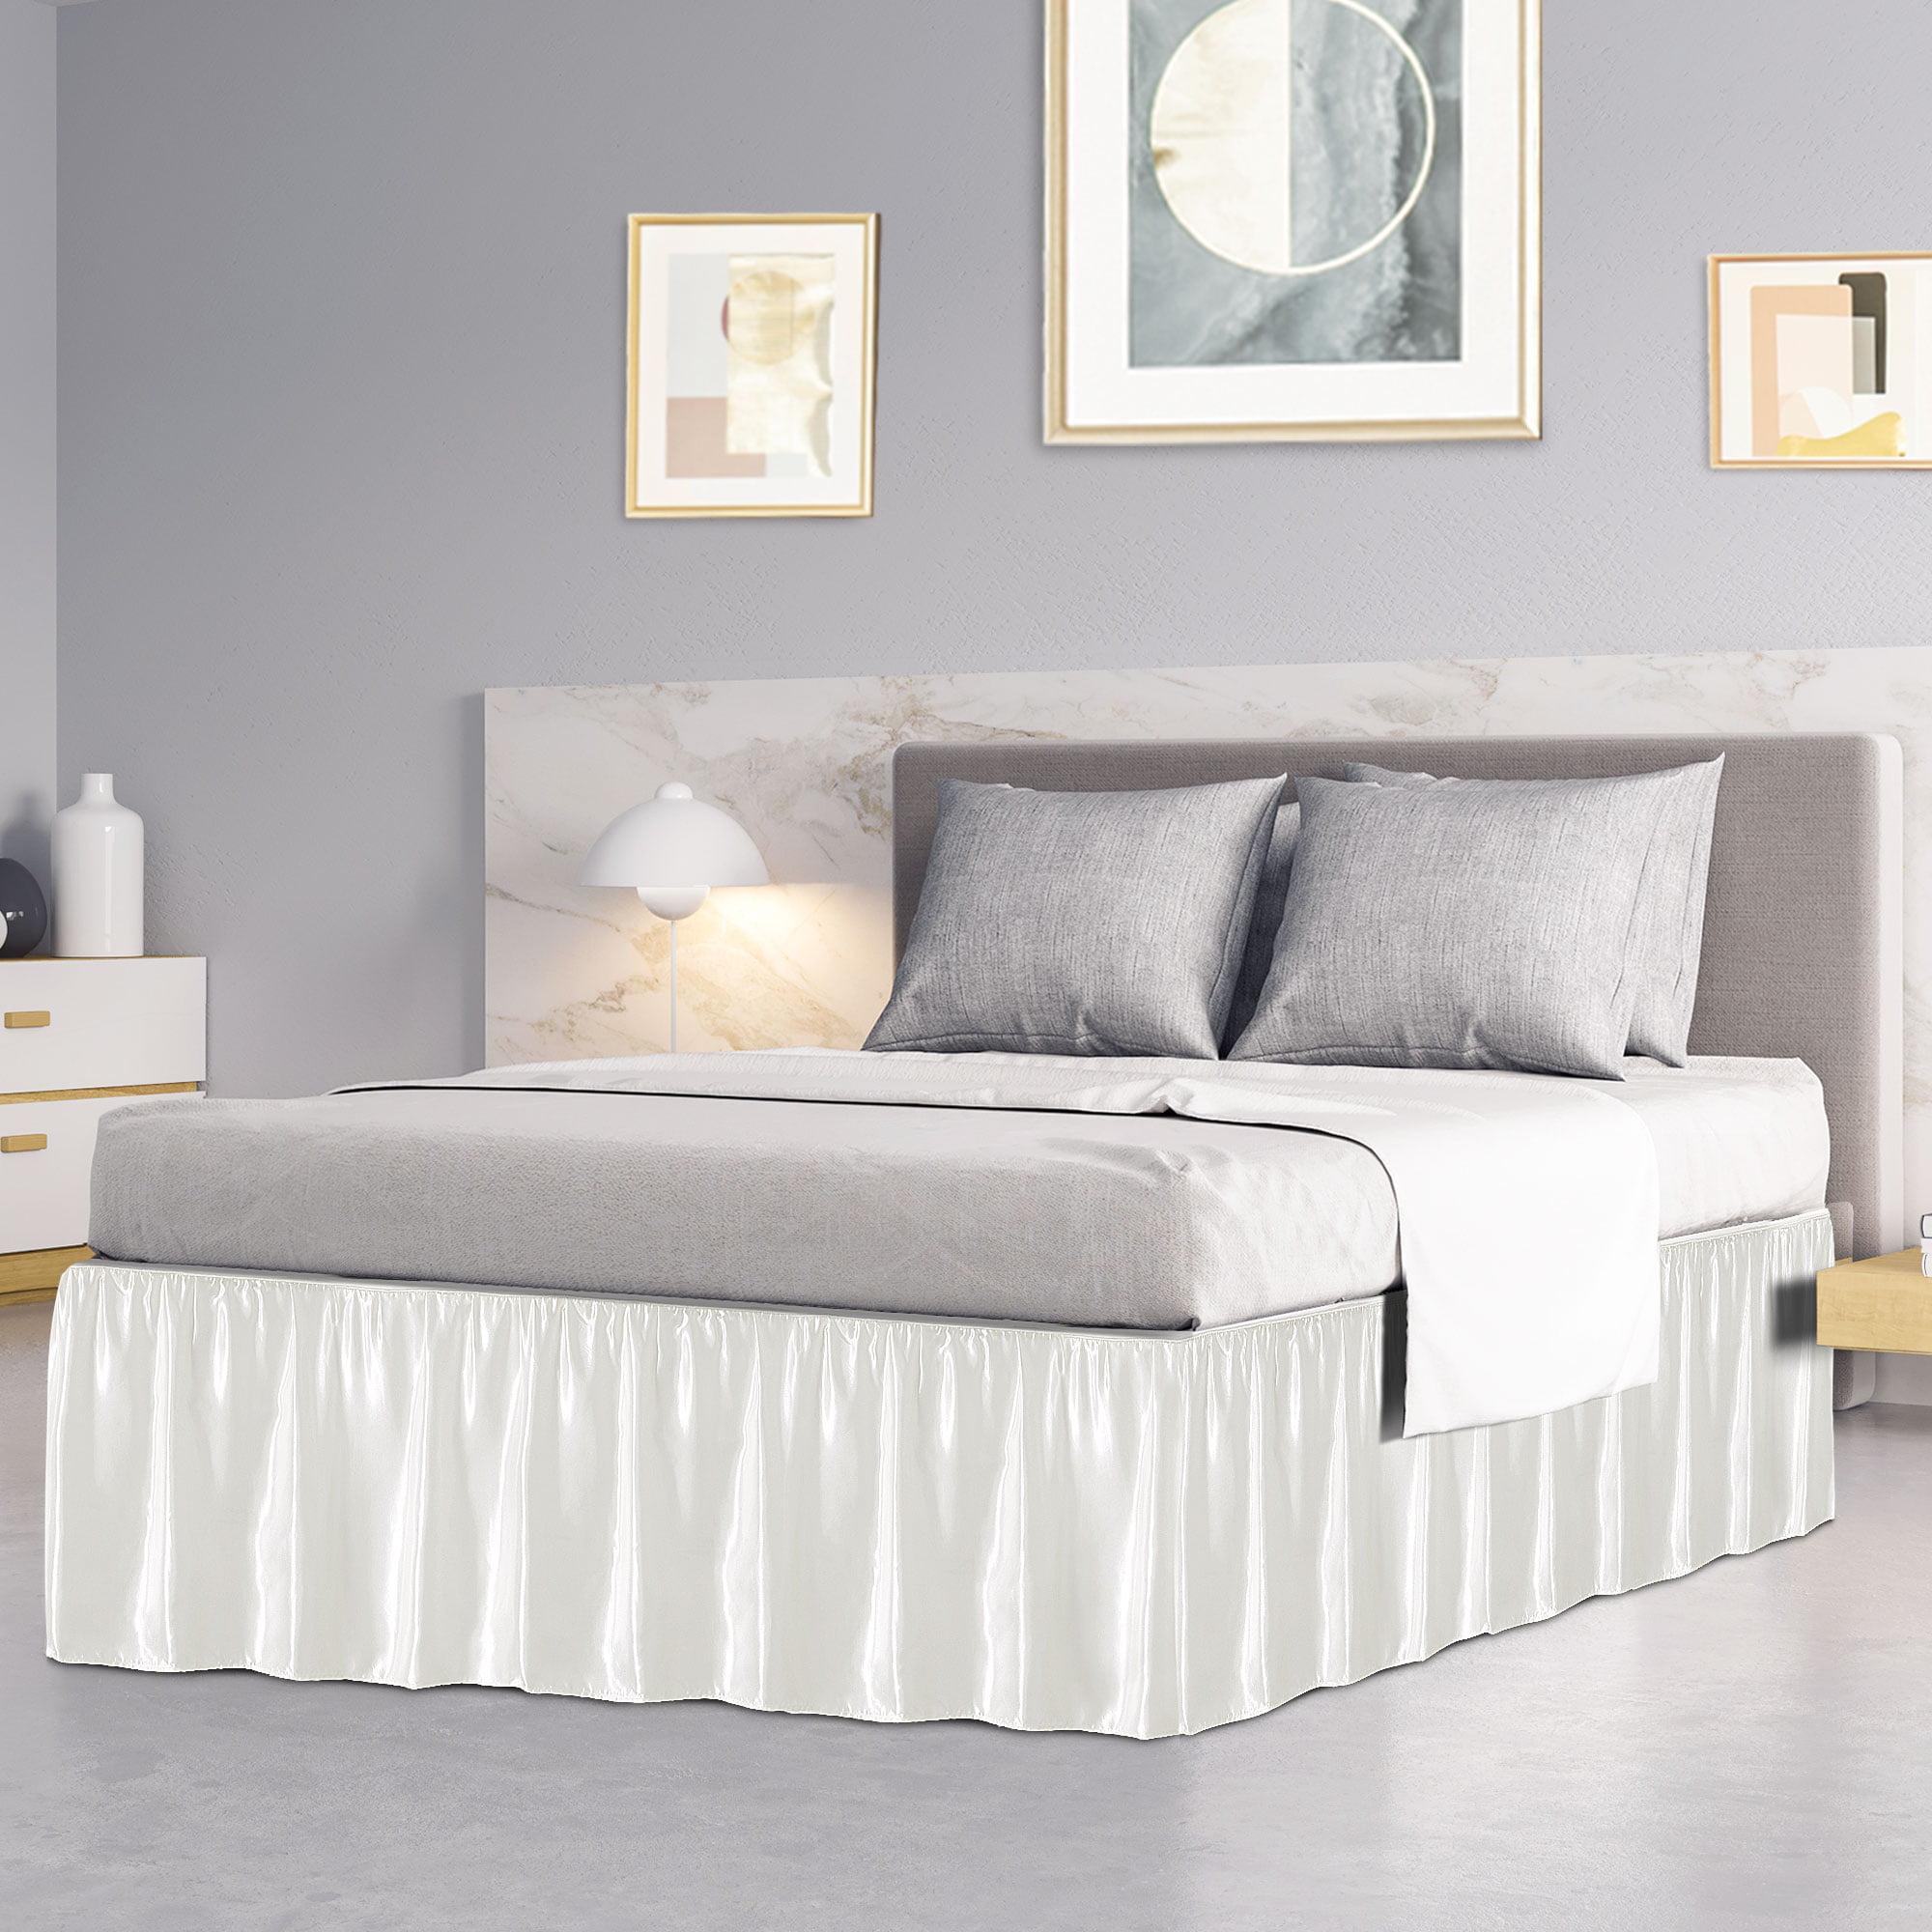 Piccocasa Bed Skirt Satin Silk 18 Drop Dust Ruffle Cream White Queen Walmart Com Walmart Com